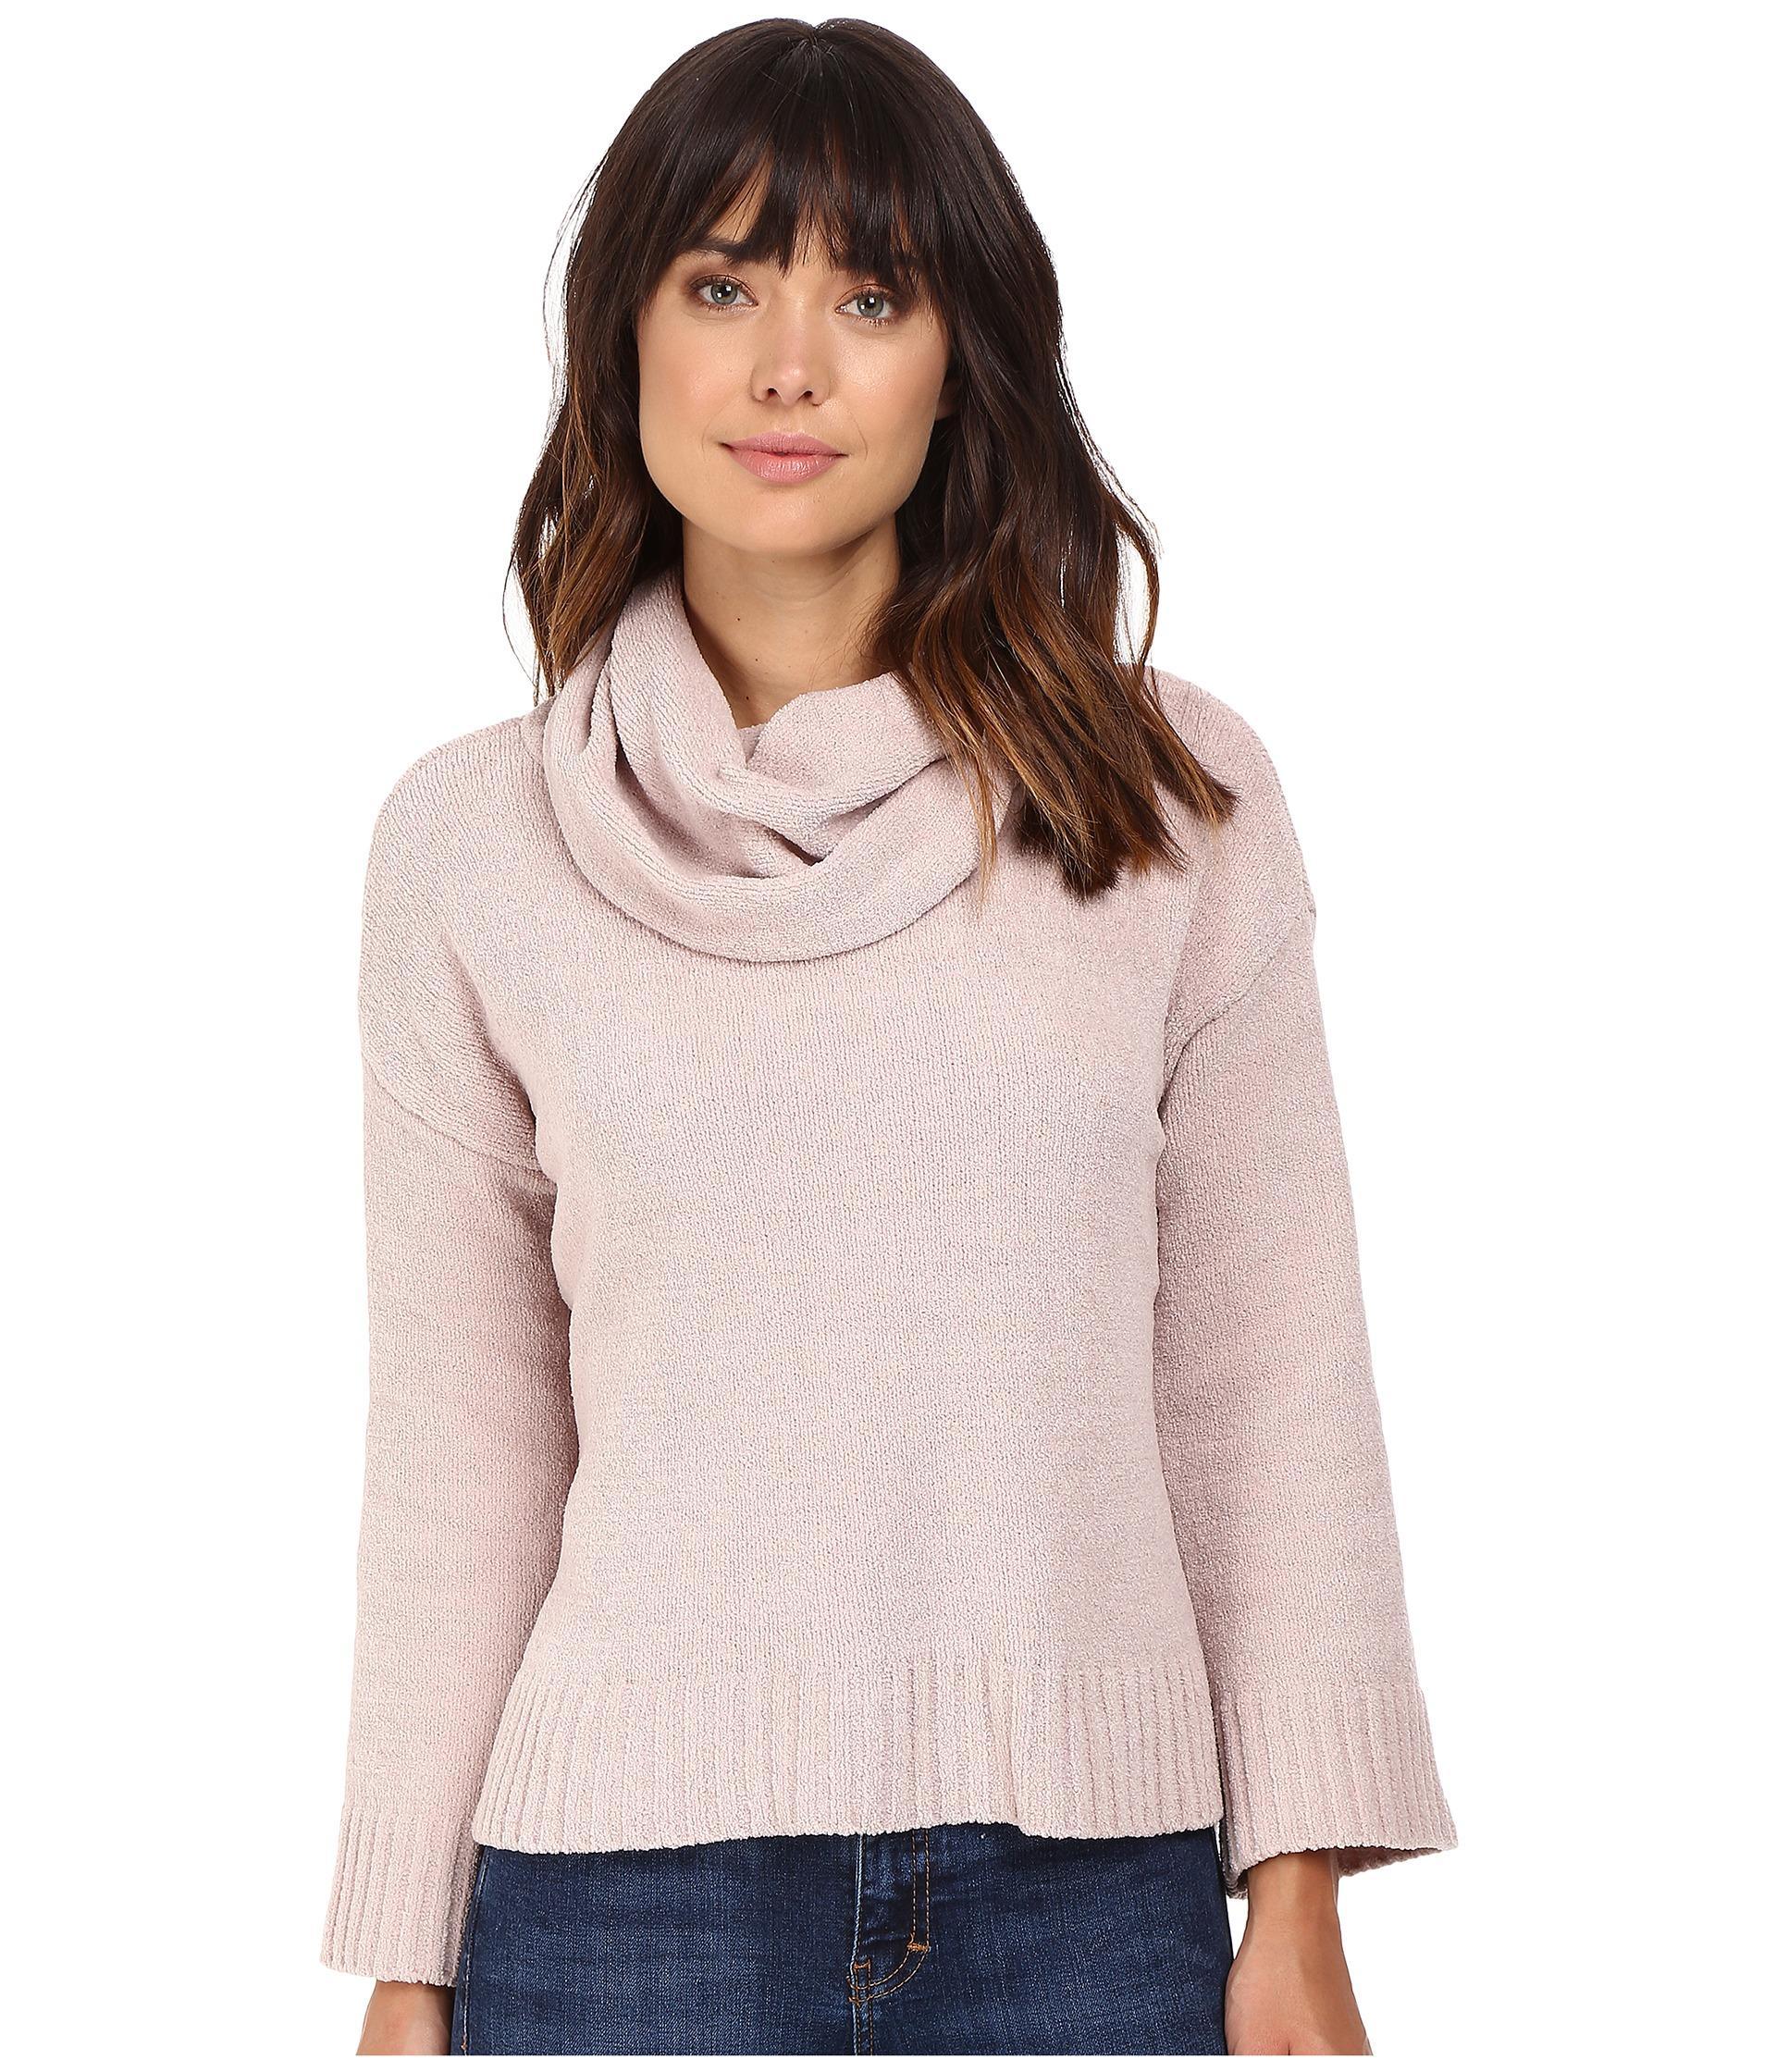 Bb dakota Marcilly Cowl Neck Sweater in Pink | Lyst